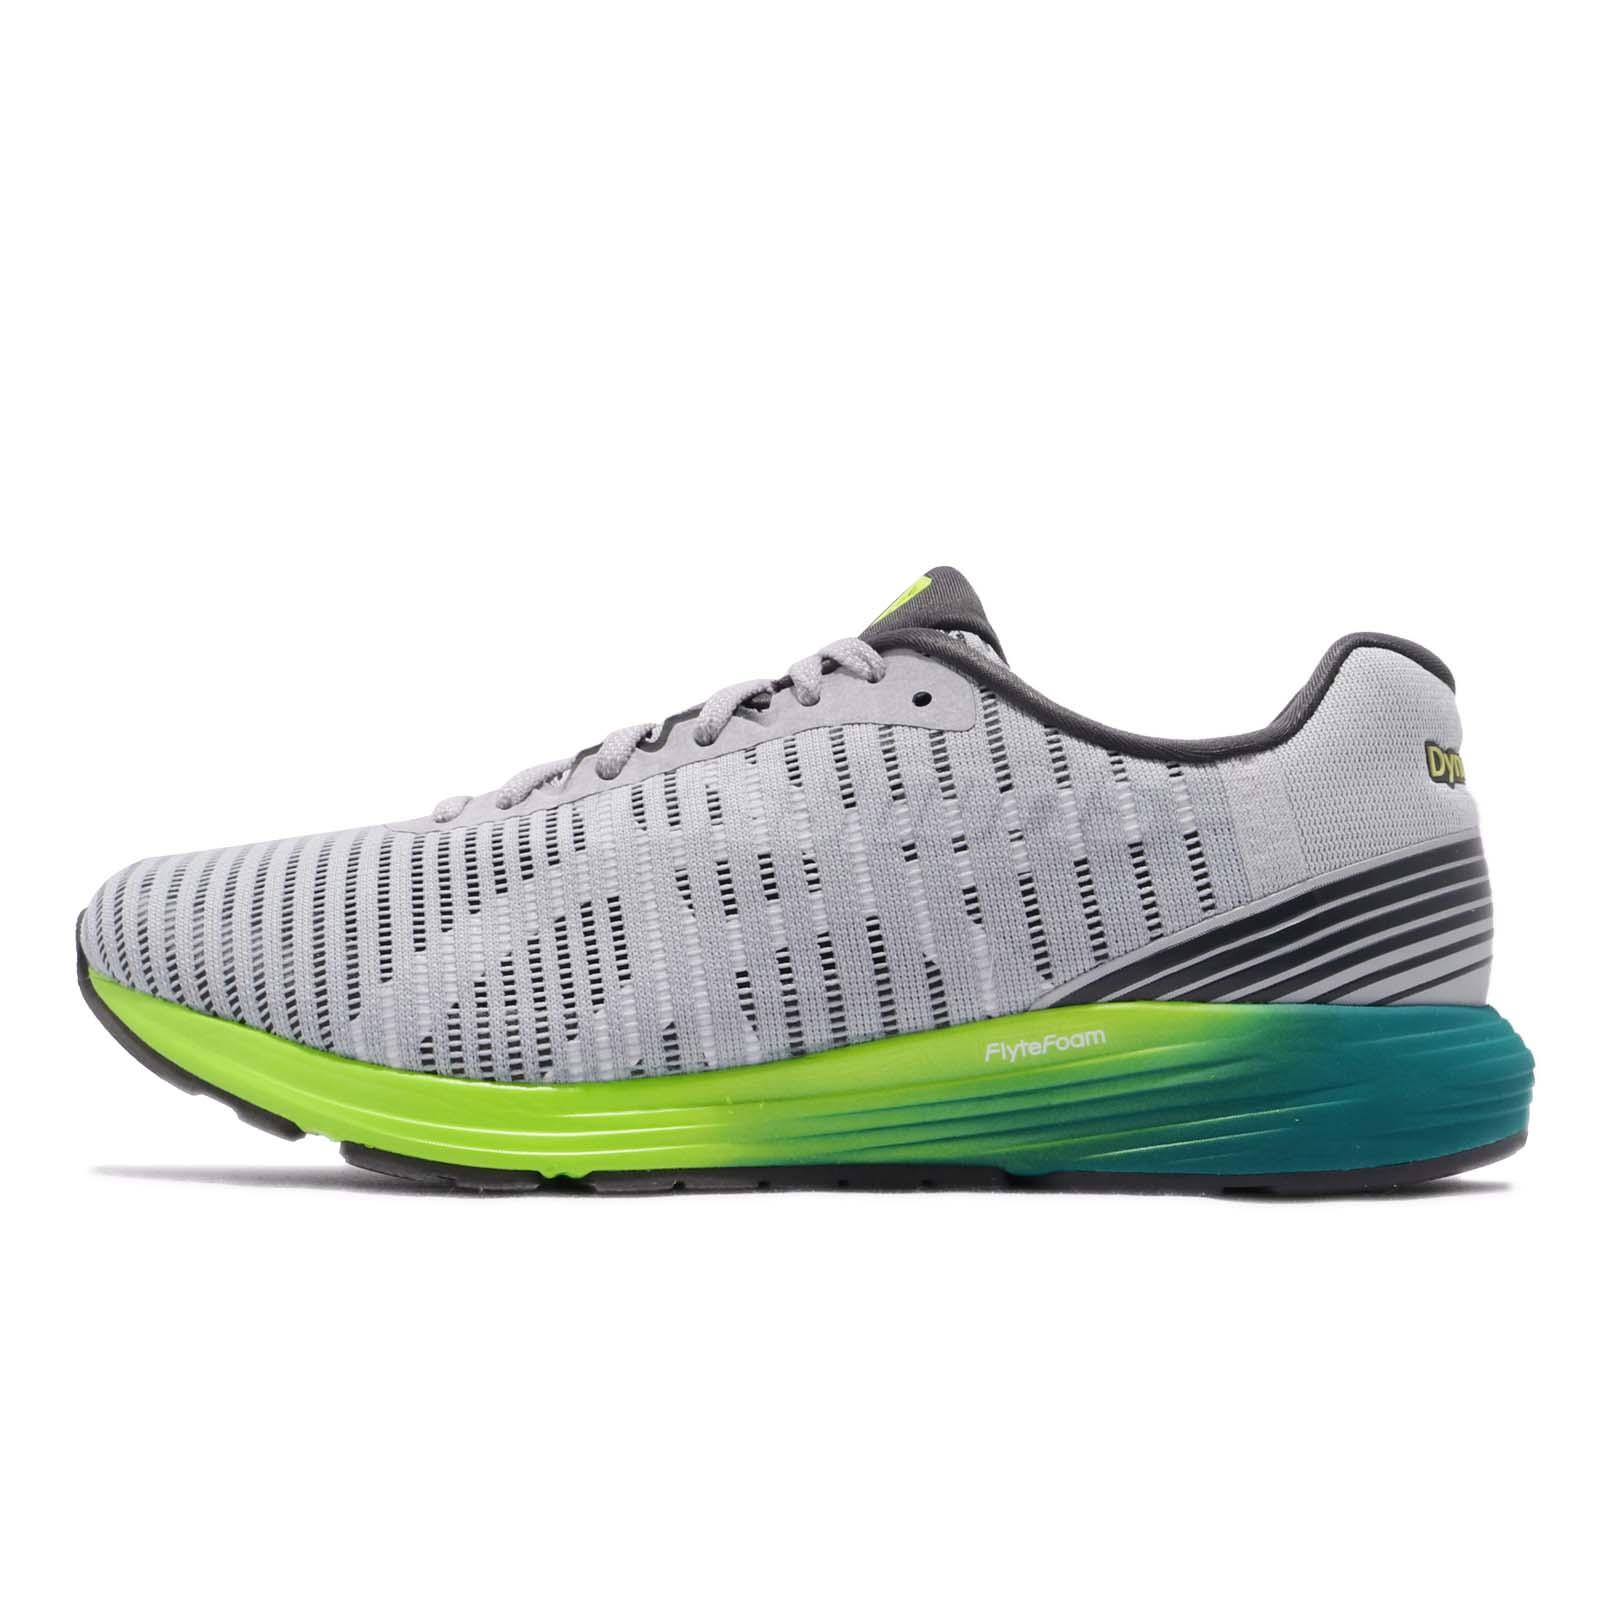 7cceba37ff Asics Dynaflyte 3 Grey Black Green Men Running Shoes Sneakers 1011A002-021